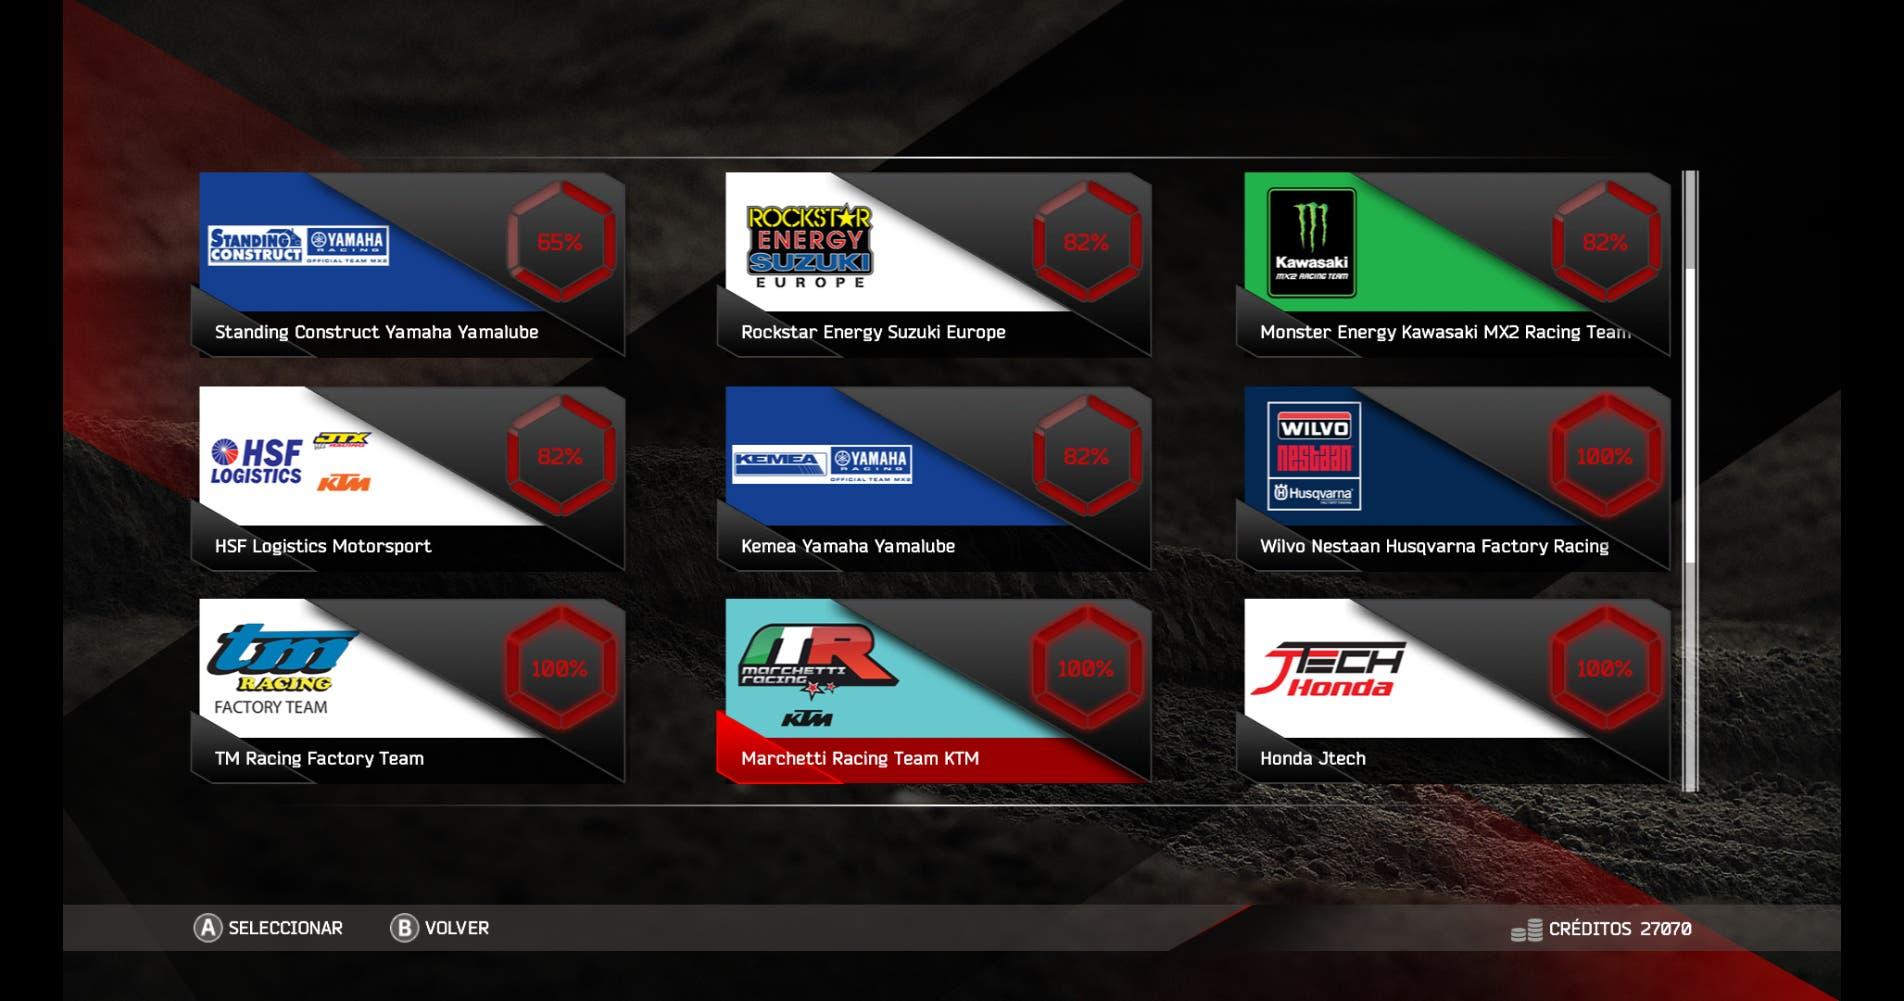 MXGP2 - The Official Motocross Videogame 09_04_2016 13_43_40